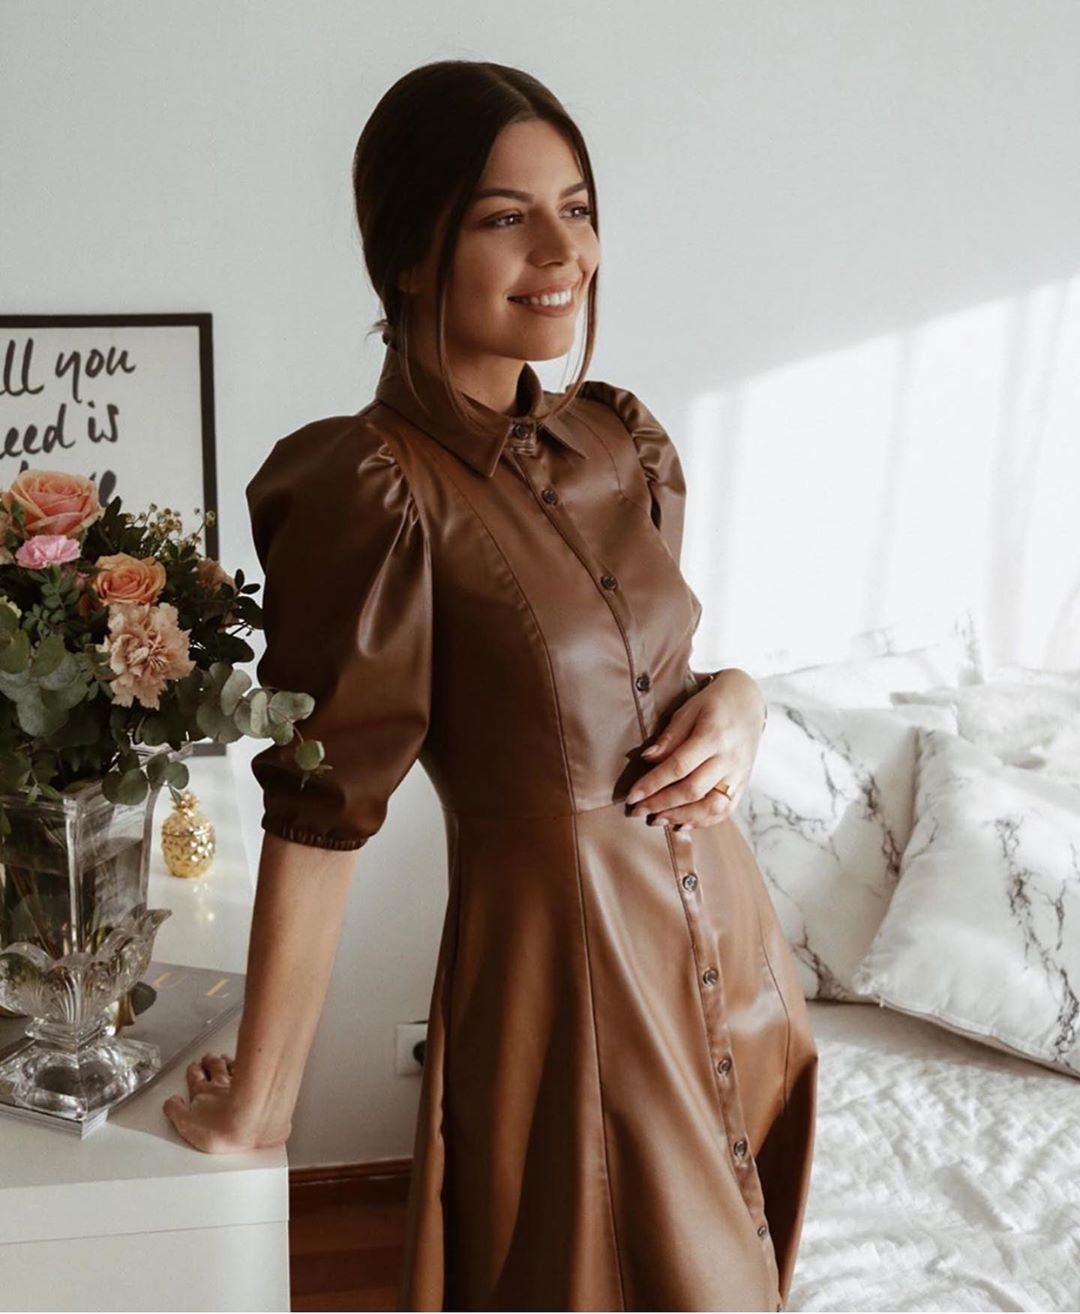 robe chemise en cuir synthétique de Zara sur zara.outfits